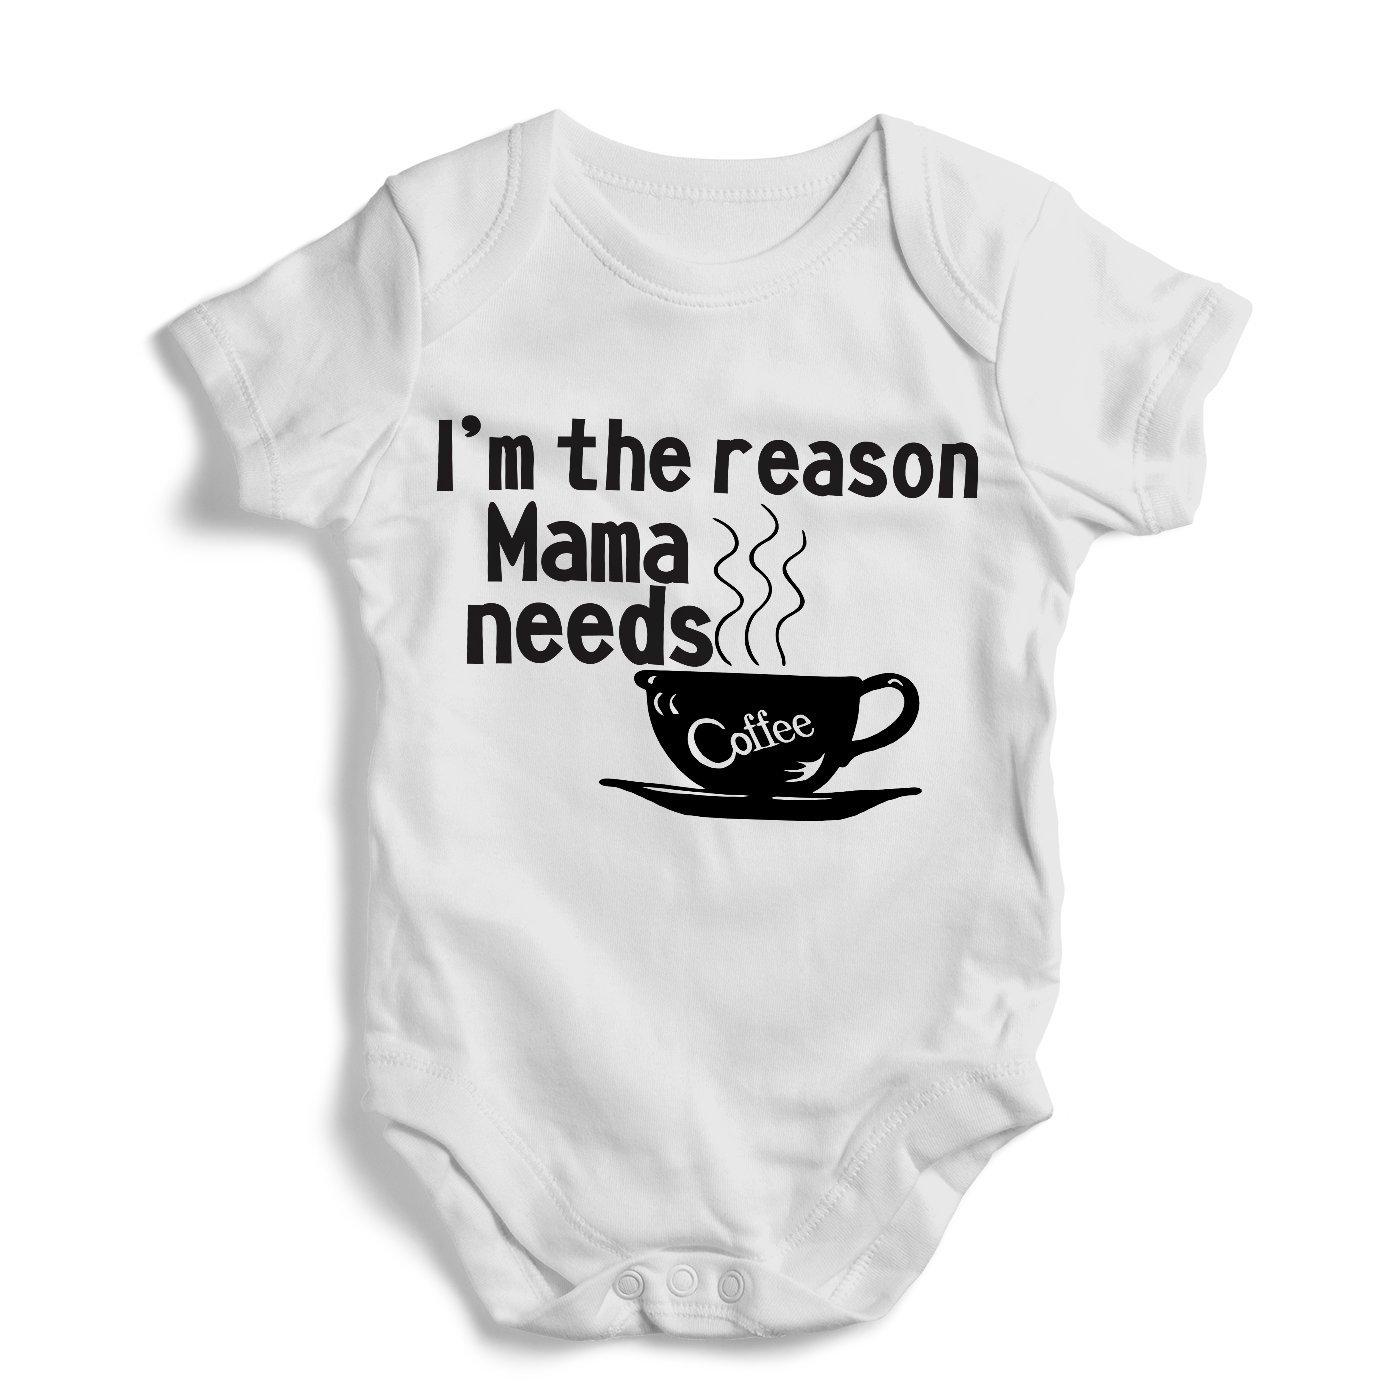 6d5357579 Amazon.com  I m the reason mama needs coffee - Onesie